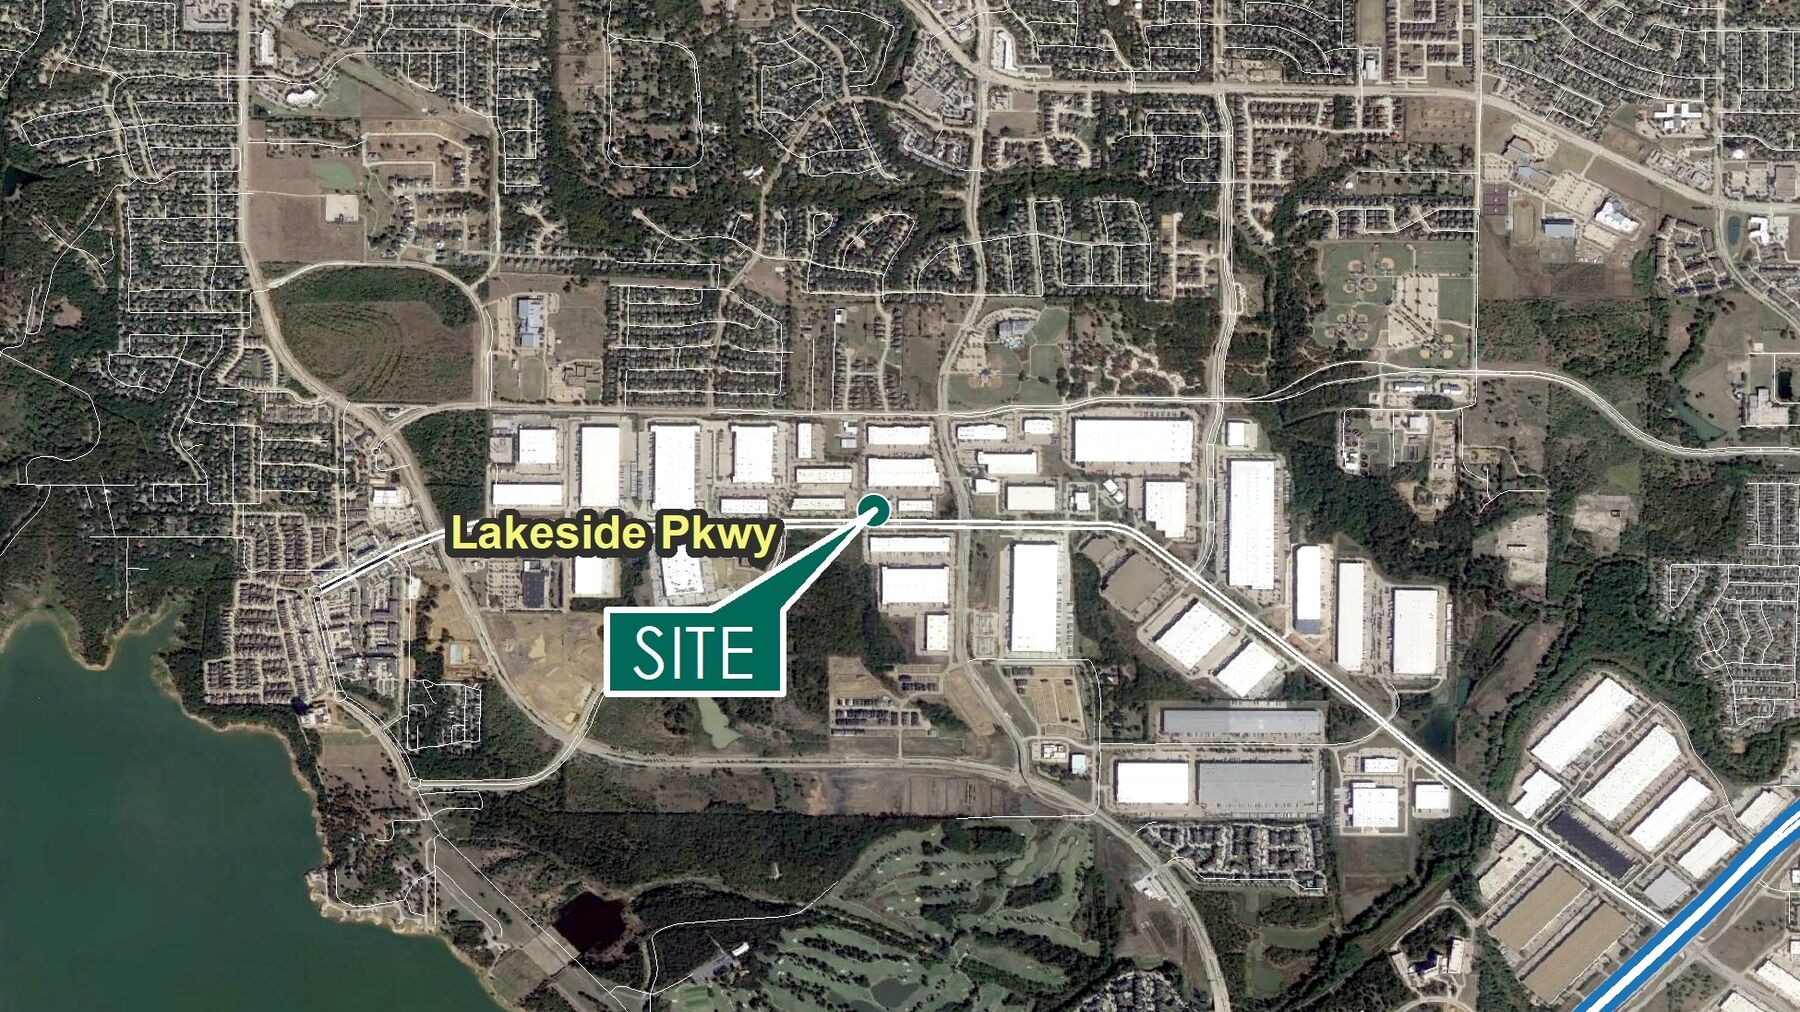 DPM-Prologis-Flower-Mound-3-DAL01403-1200-Lakeside-Parkway_AerialMap.jpg